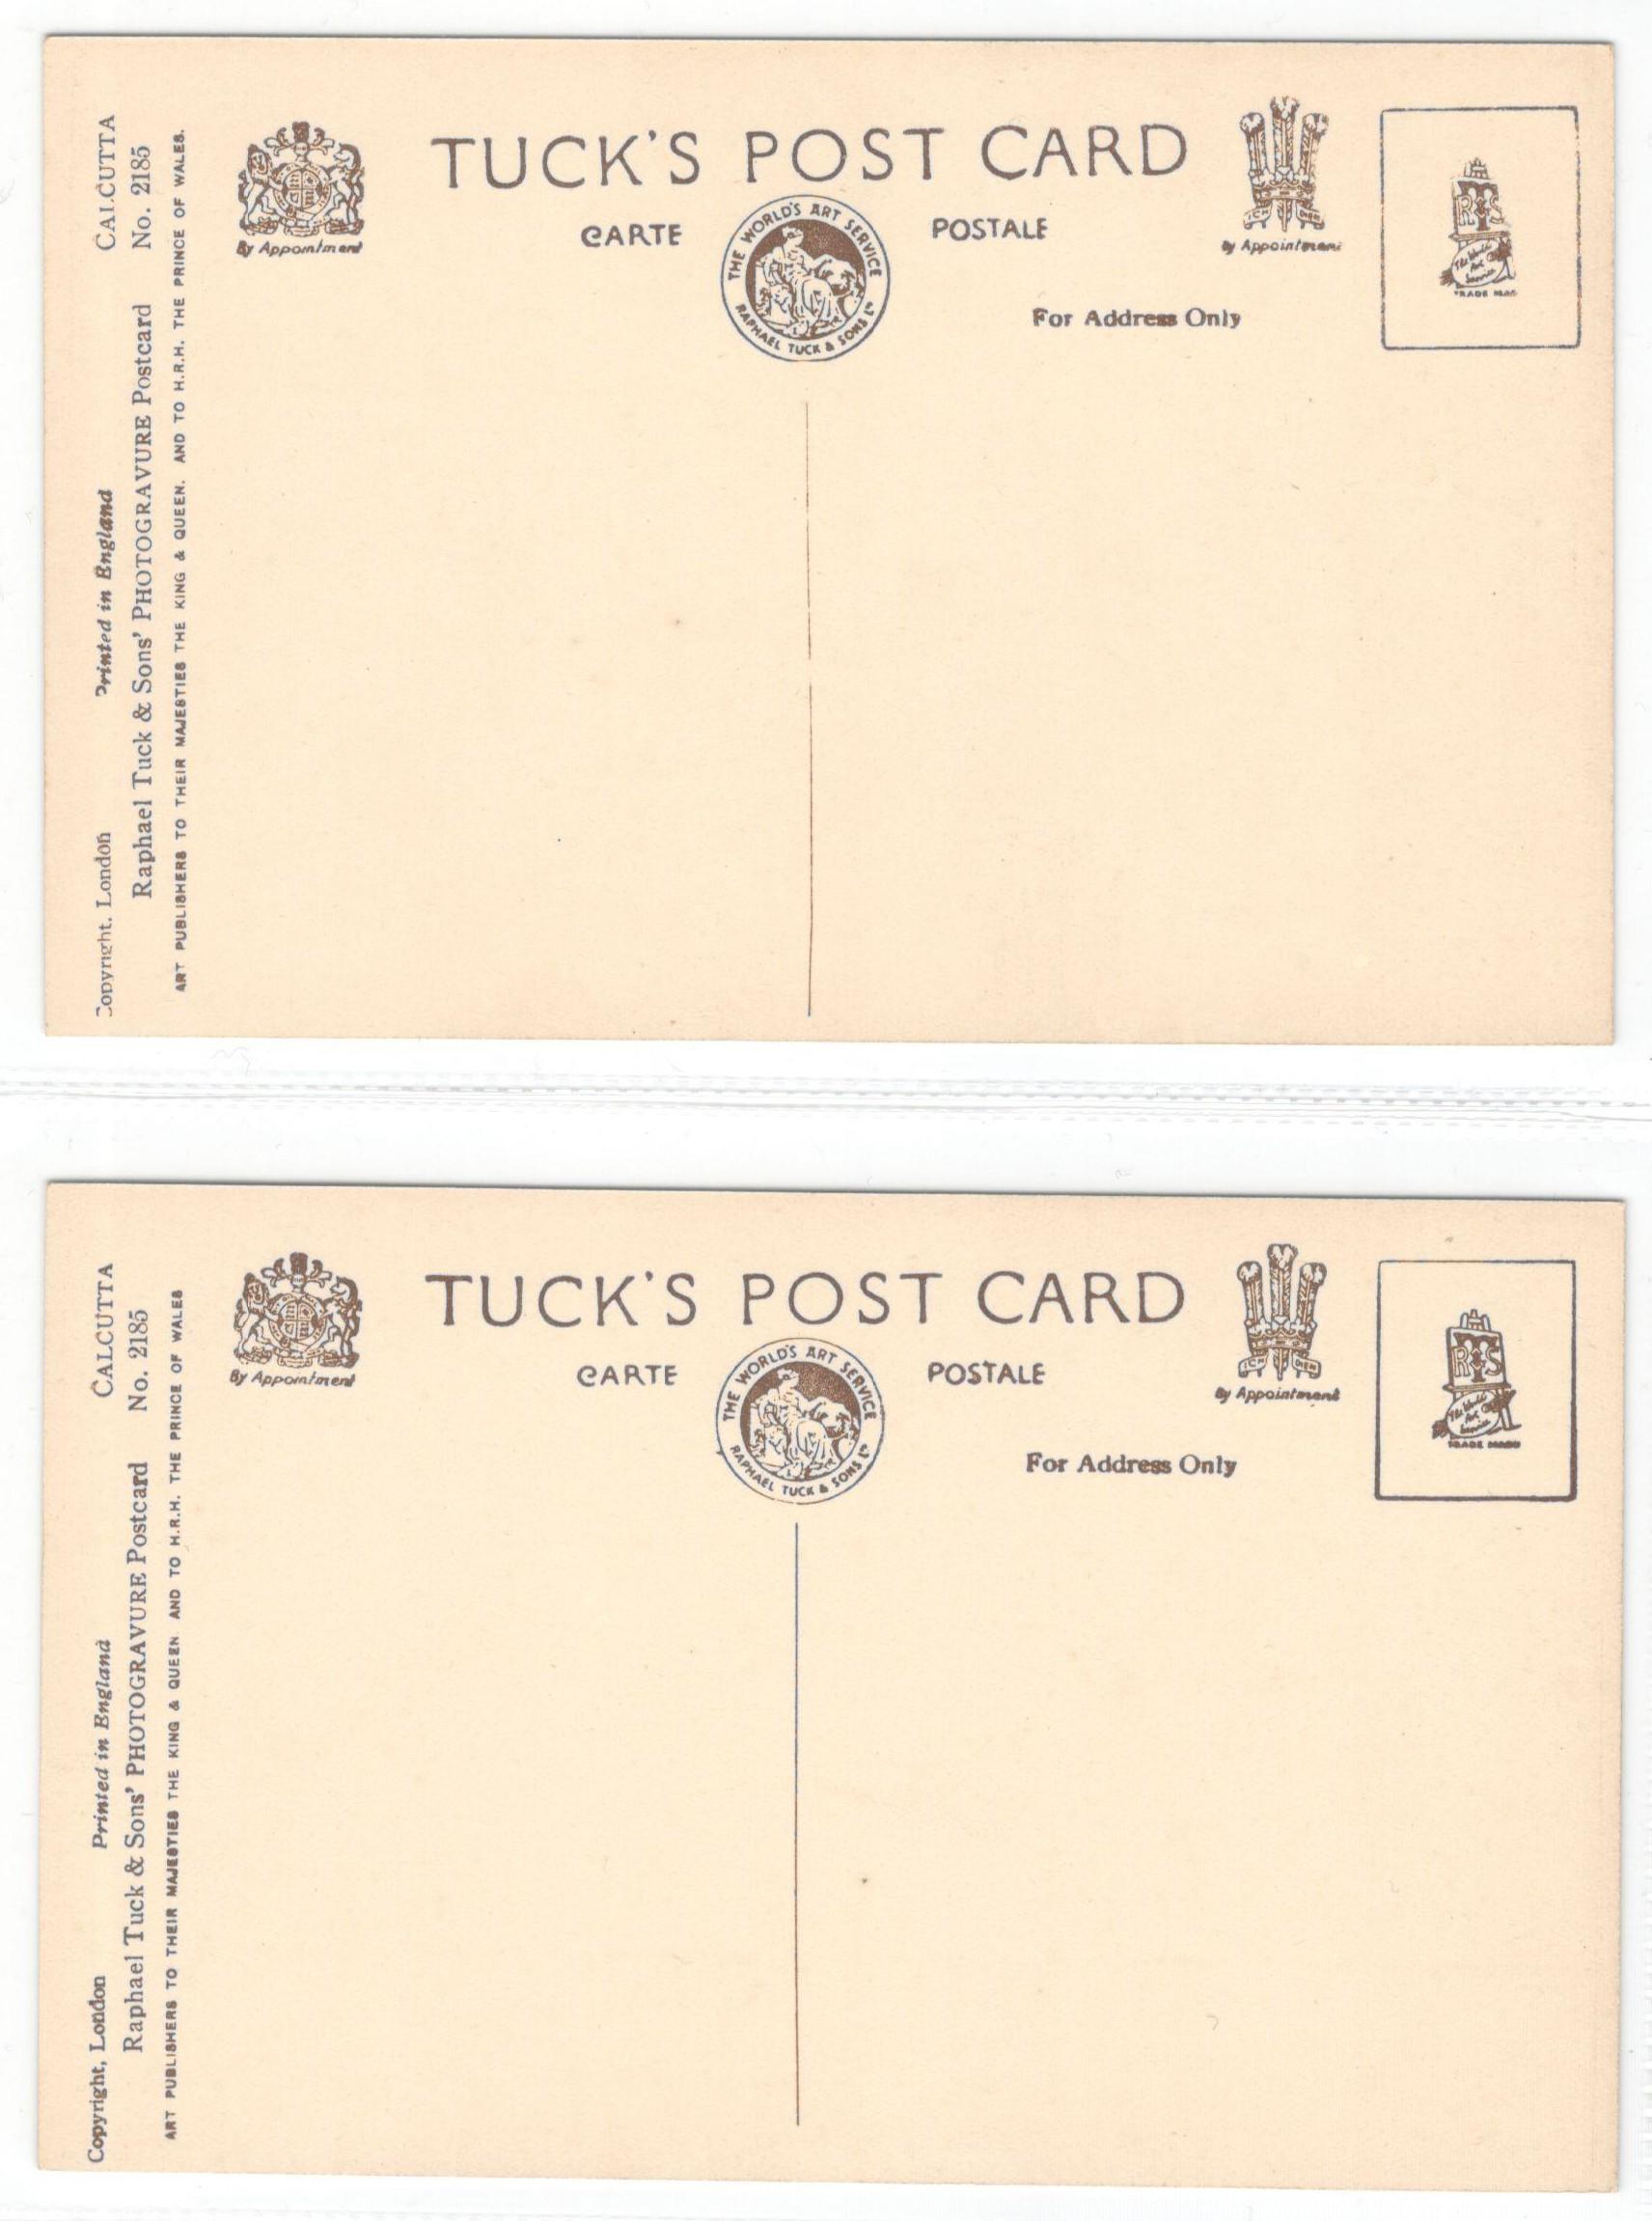 RAPHAEL TUCK POSTCARDS SET OF TEN CALCUTTA - 2185 - Image 4 of 4